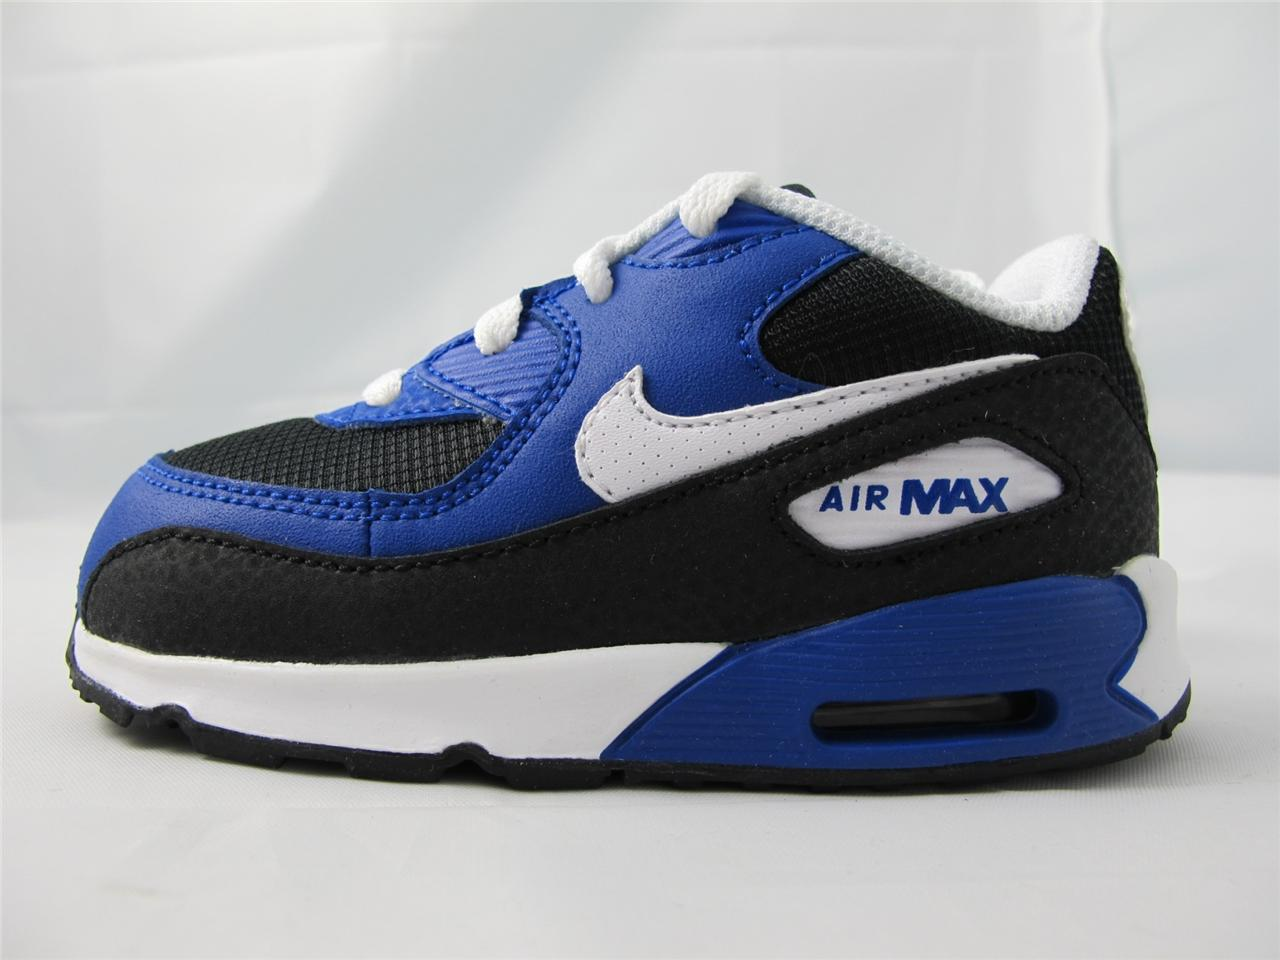 b2c958740b88 Nike Air Max 90 White Hyper Blue Black